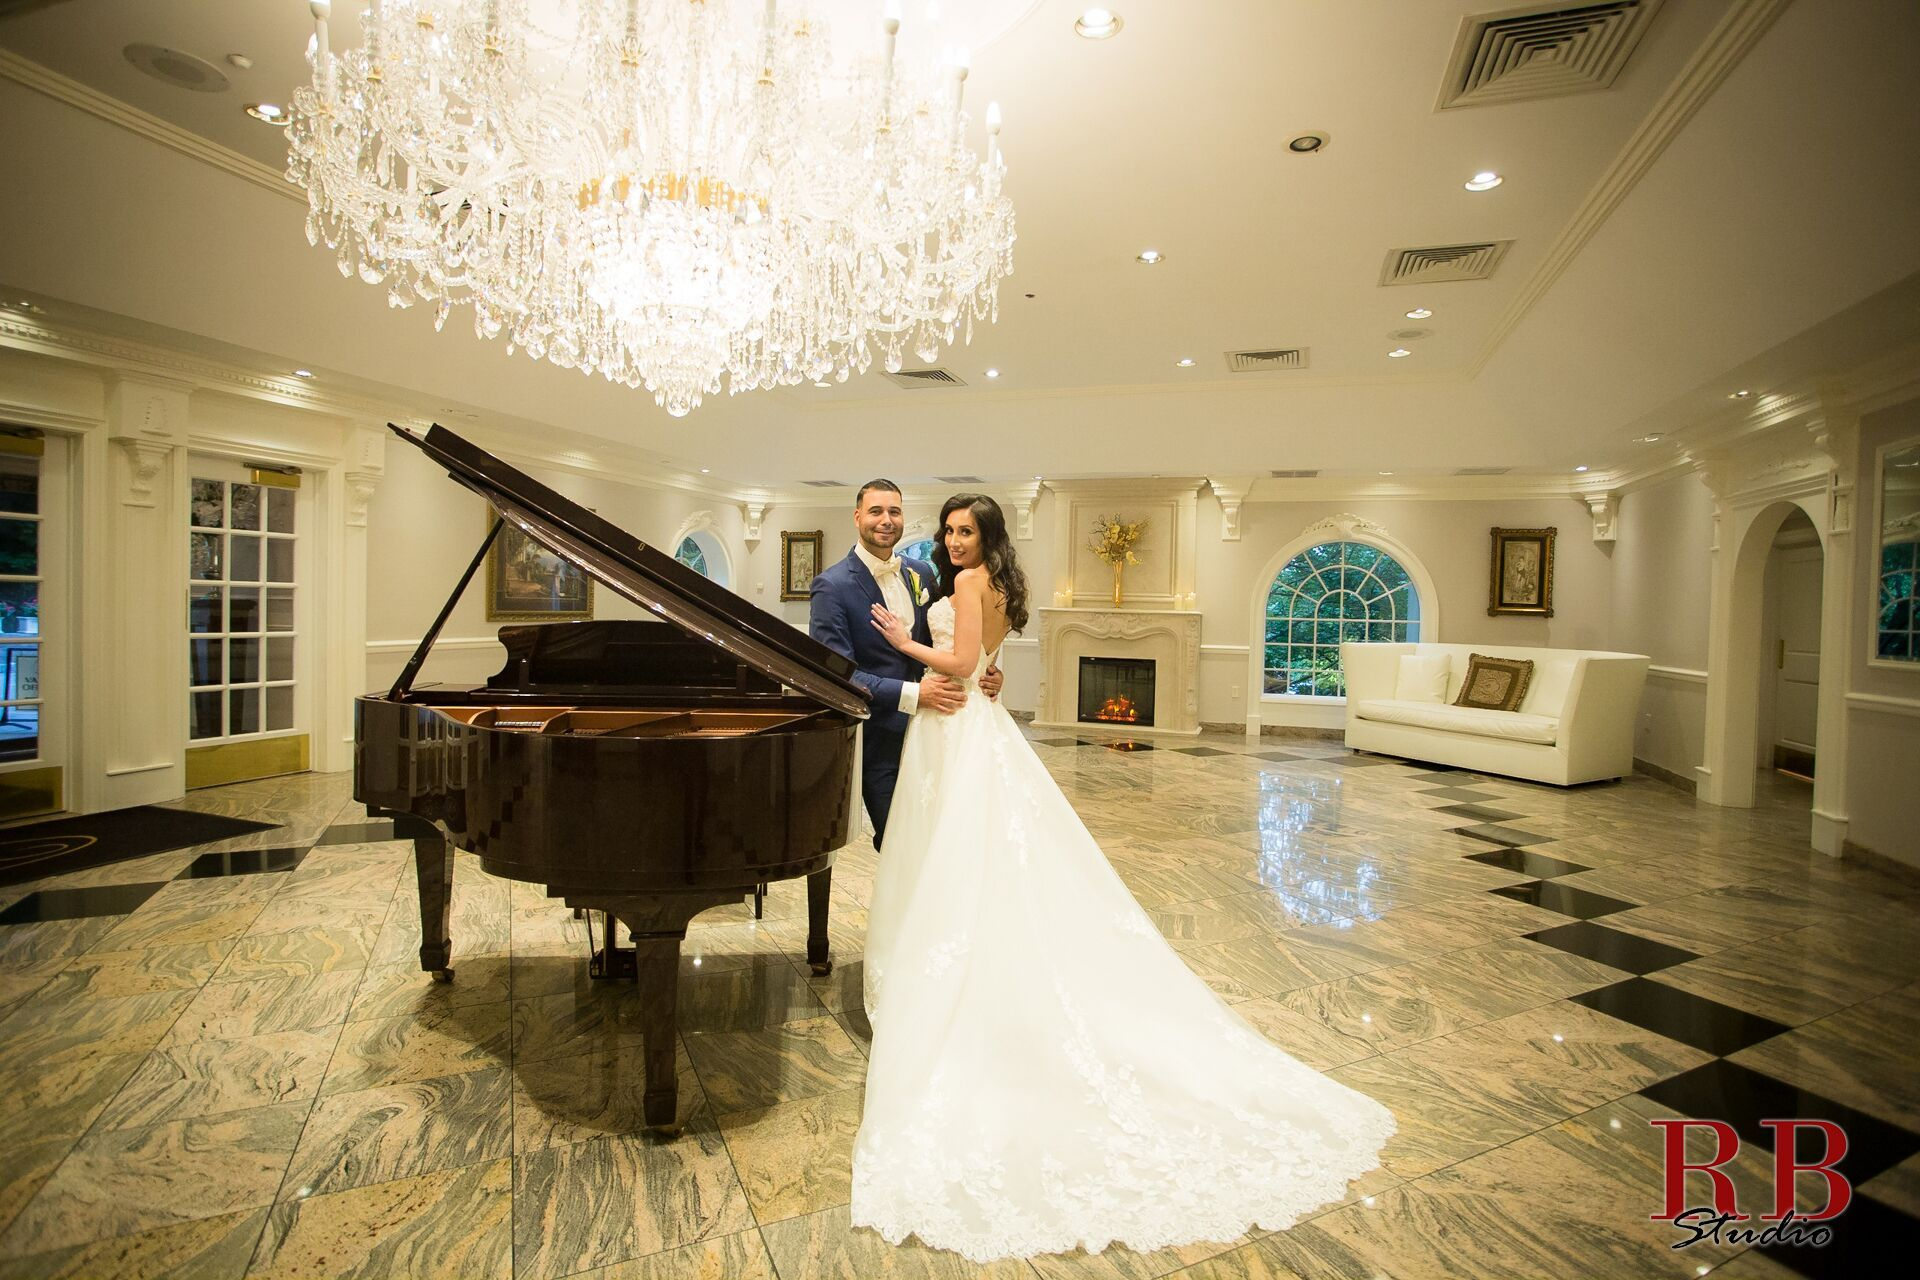 Congratulations to michael barsis on their wedding rb studio congratulations to michael barsis on their wedding rb studio team at chandelier restaurant bayonne nj newjerseywedding egyptianweddin arubaitofo Choice Image